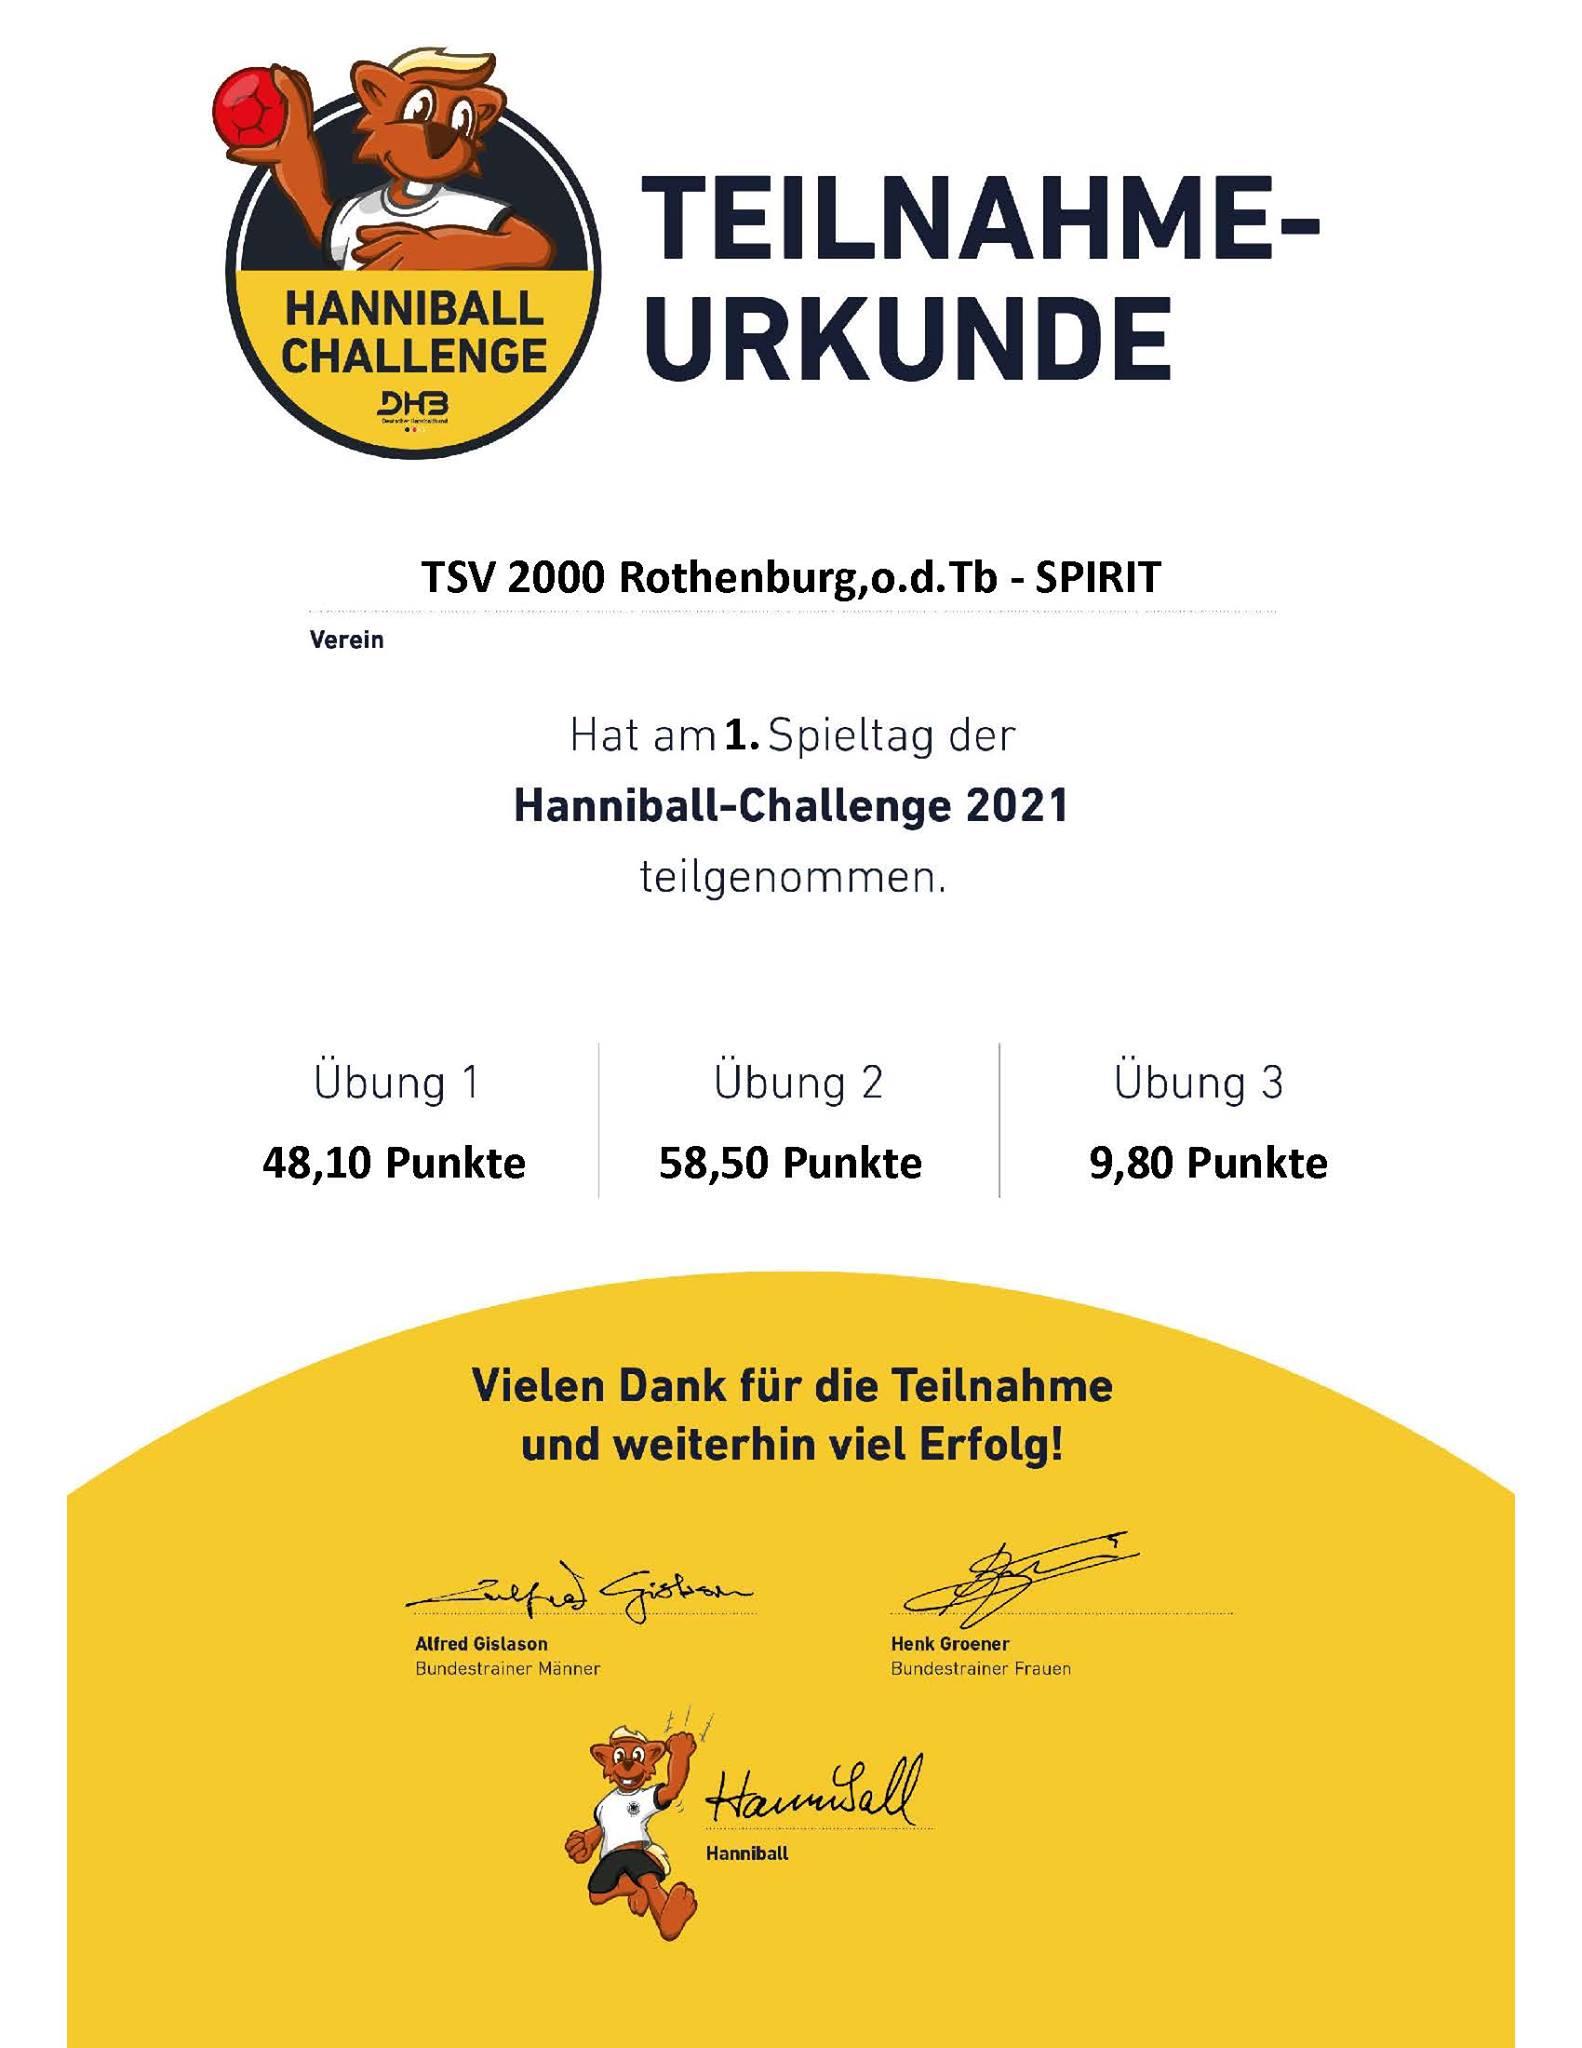 Hanniball-Challenge des DHB